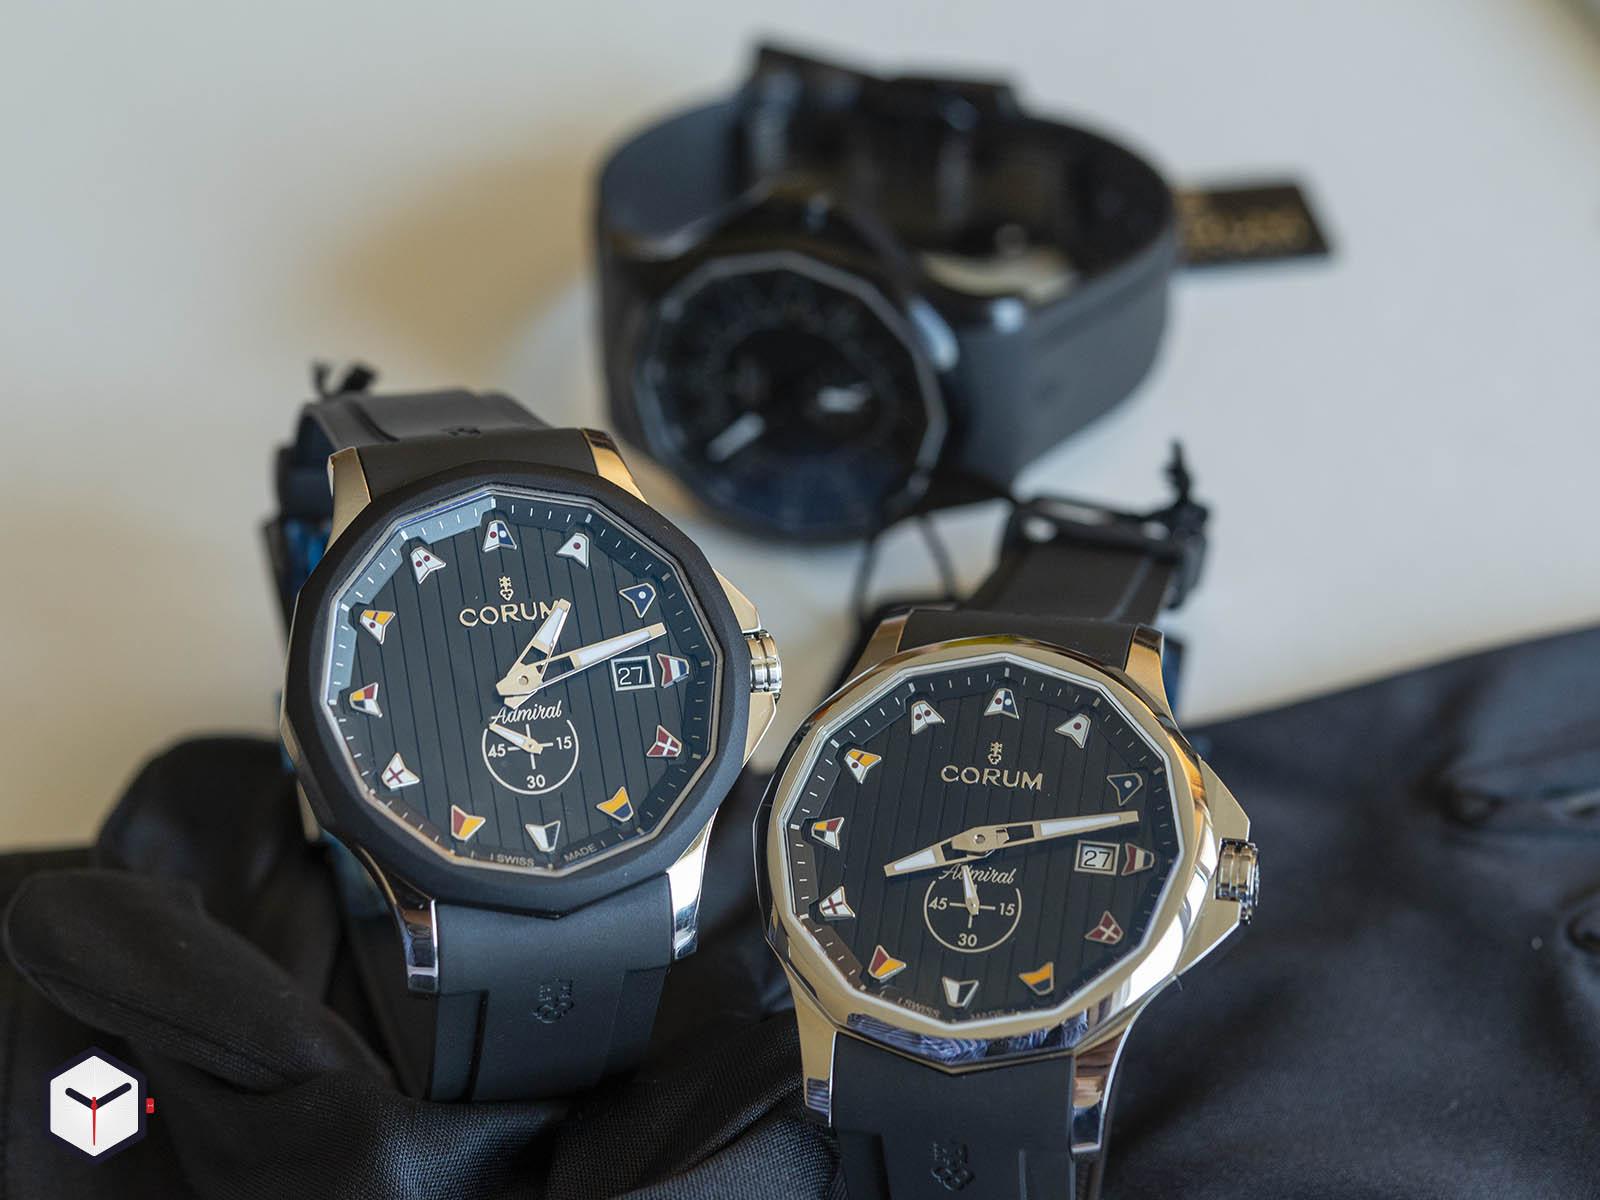 a395-03818-corum-admiral-42-full-black-limited-edition-7.jpg